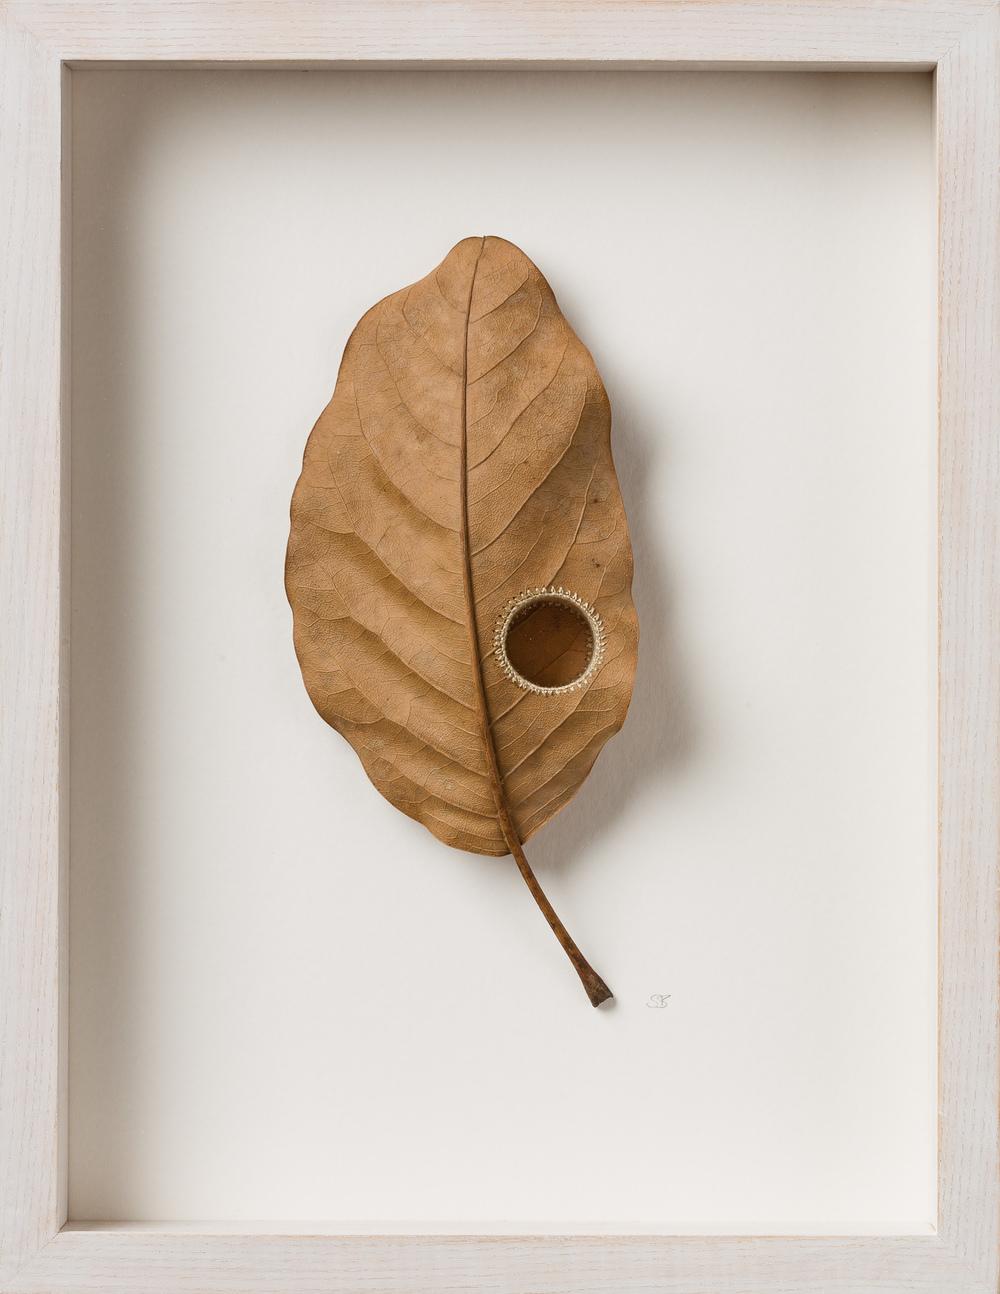 Susanna Bauer Core II 34.2 x 26.3 x 5 cm magnolia leaf & cotton yarn £ 850